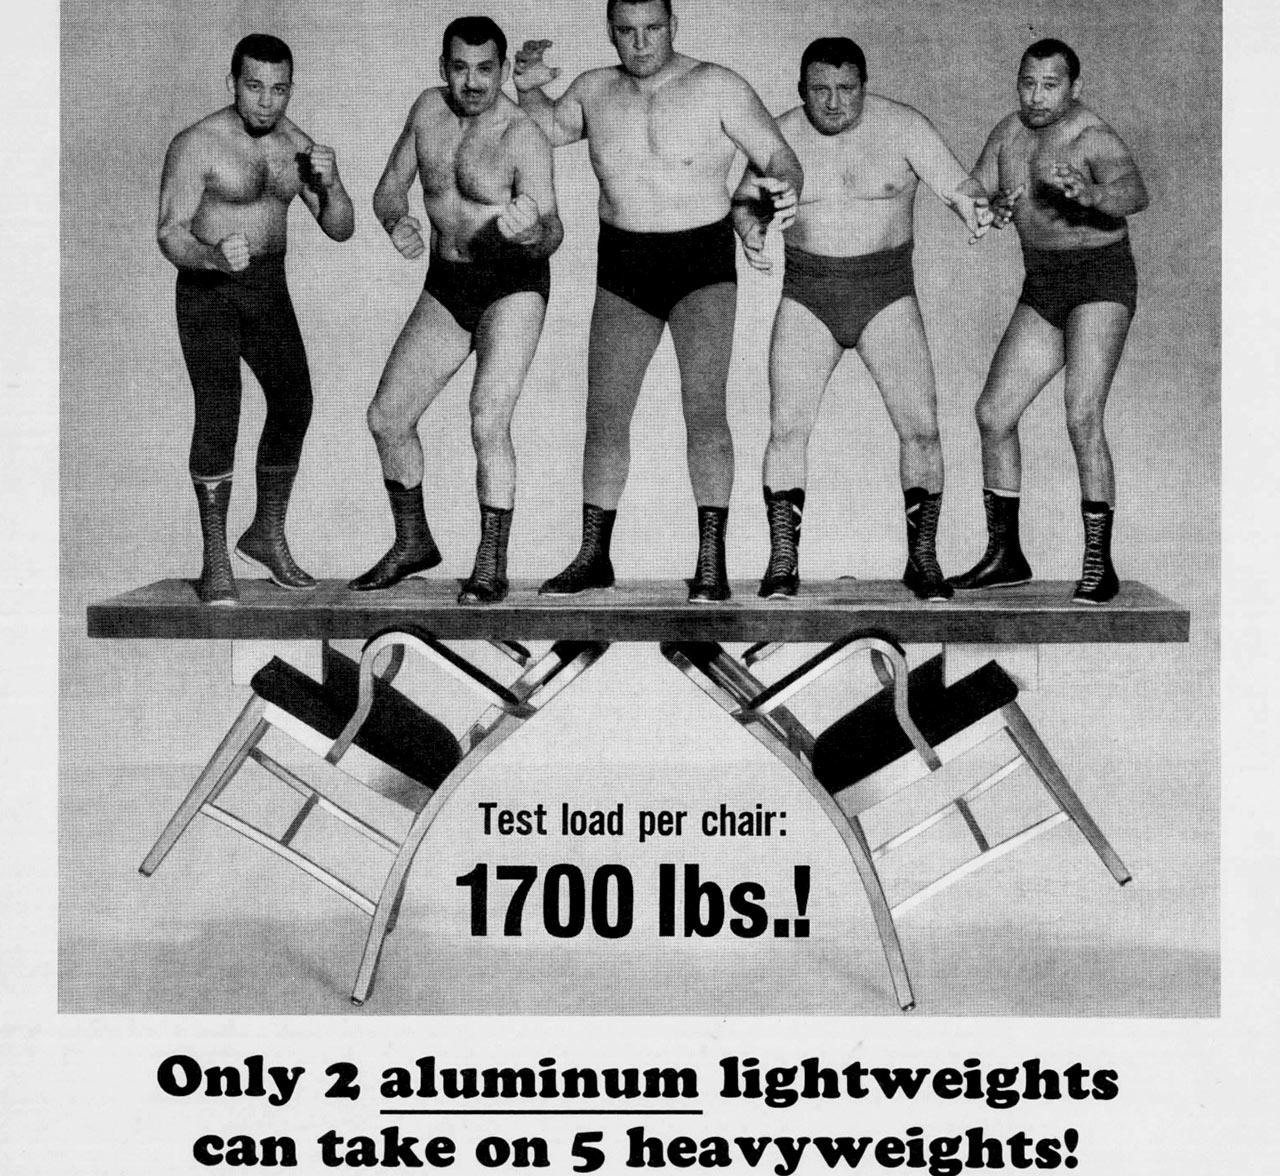 Emeco-1950-Ad-Lightweigt-vs-Heavyweight